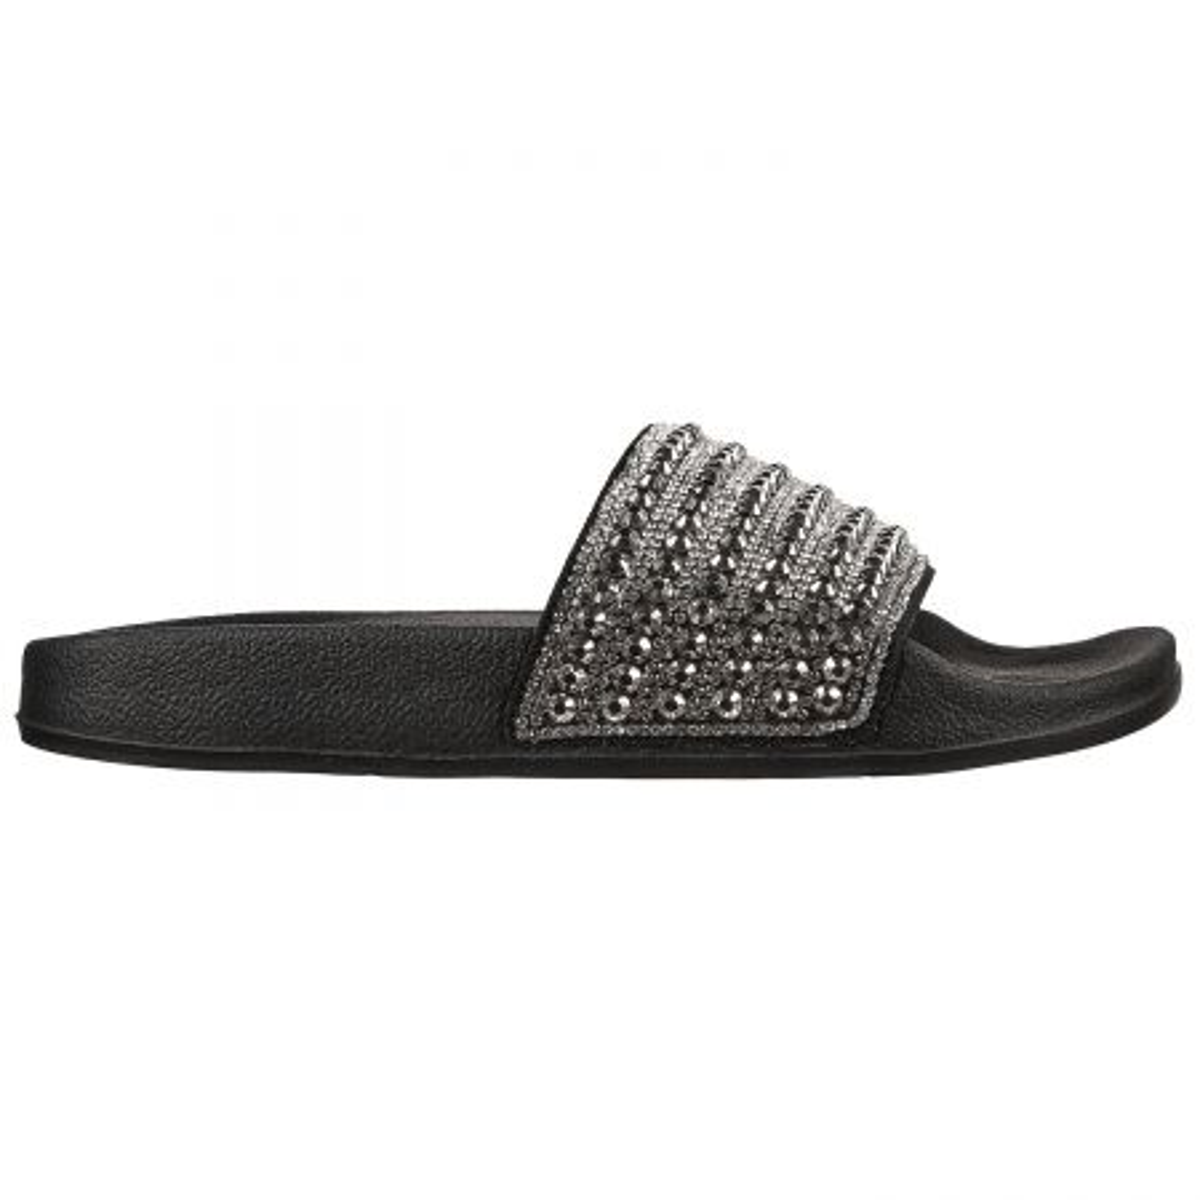 Skechers Pop Ups - Rocker Glam papuče